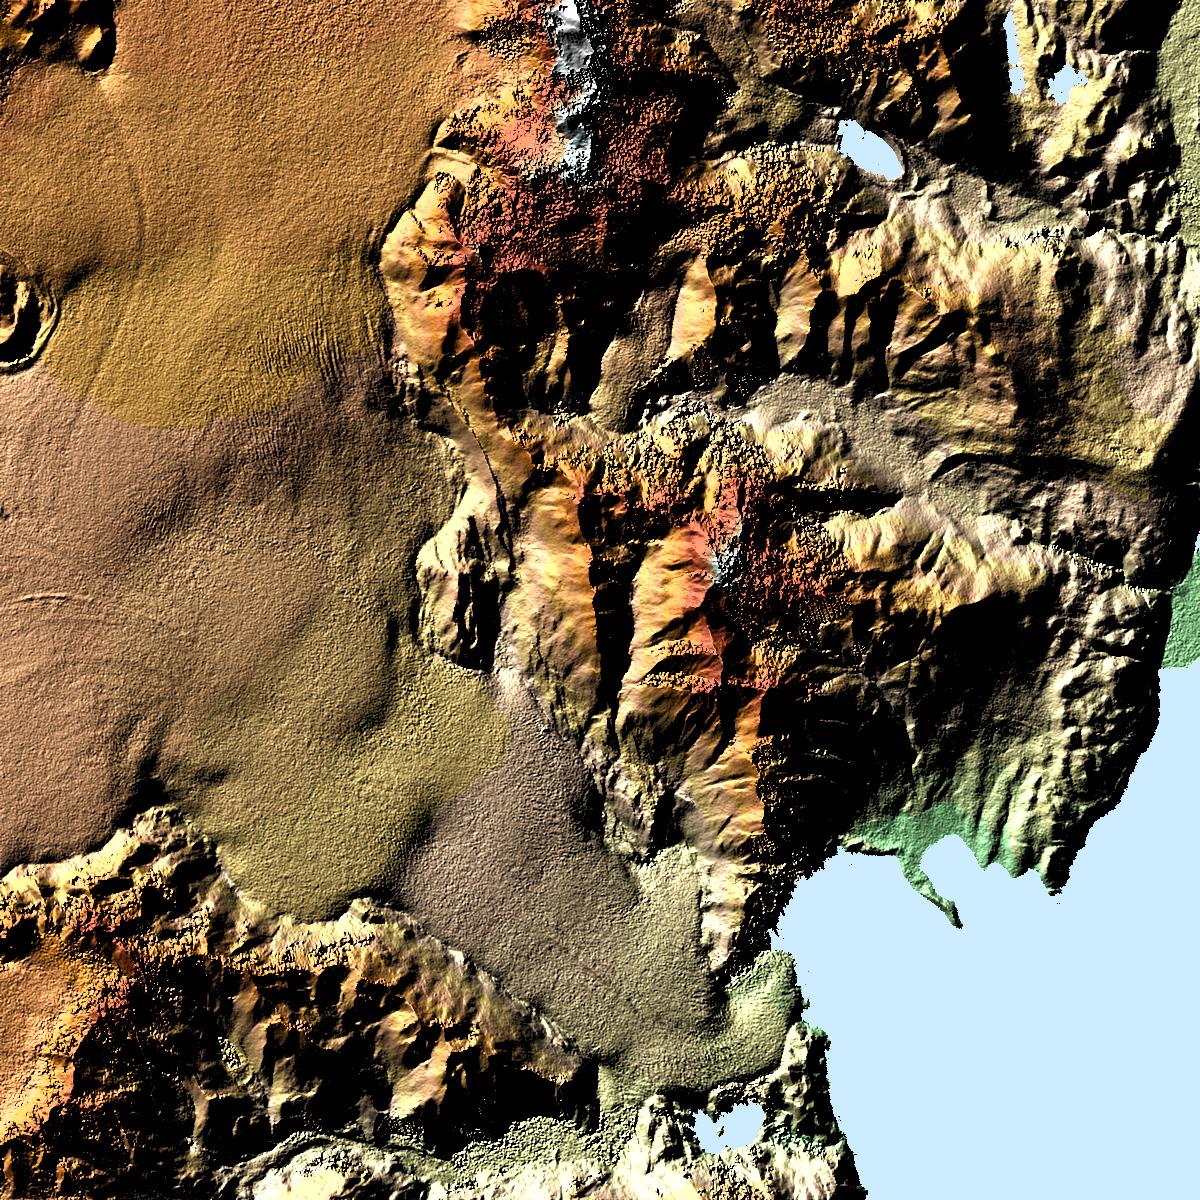 Viedma Glacier and Mount Fitzroy, Argentina